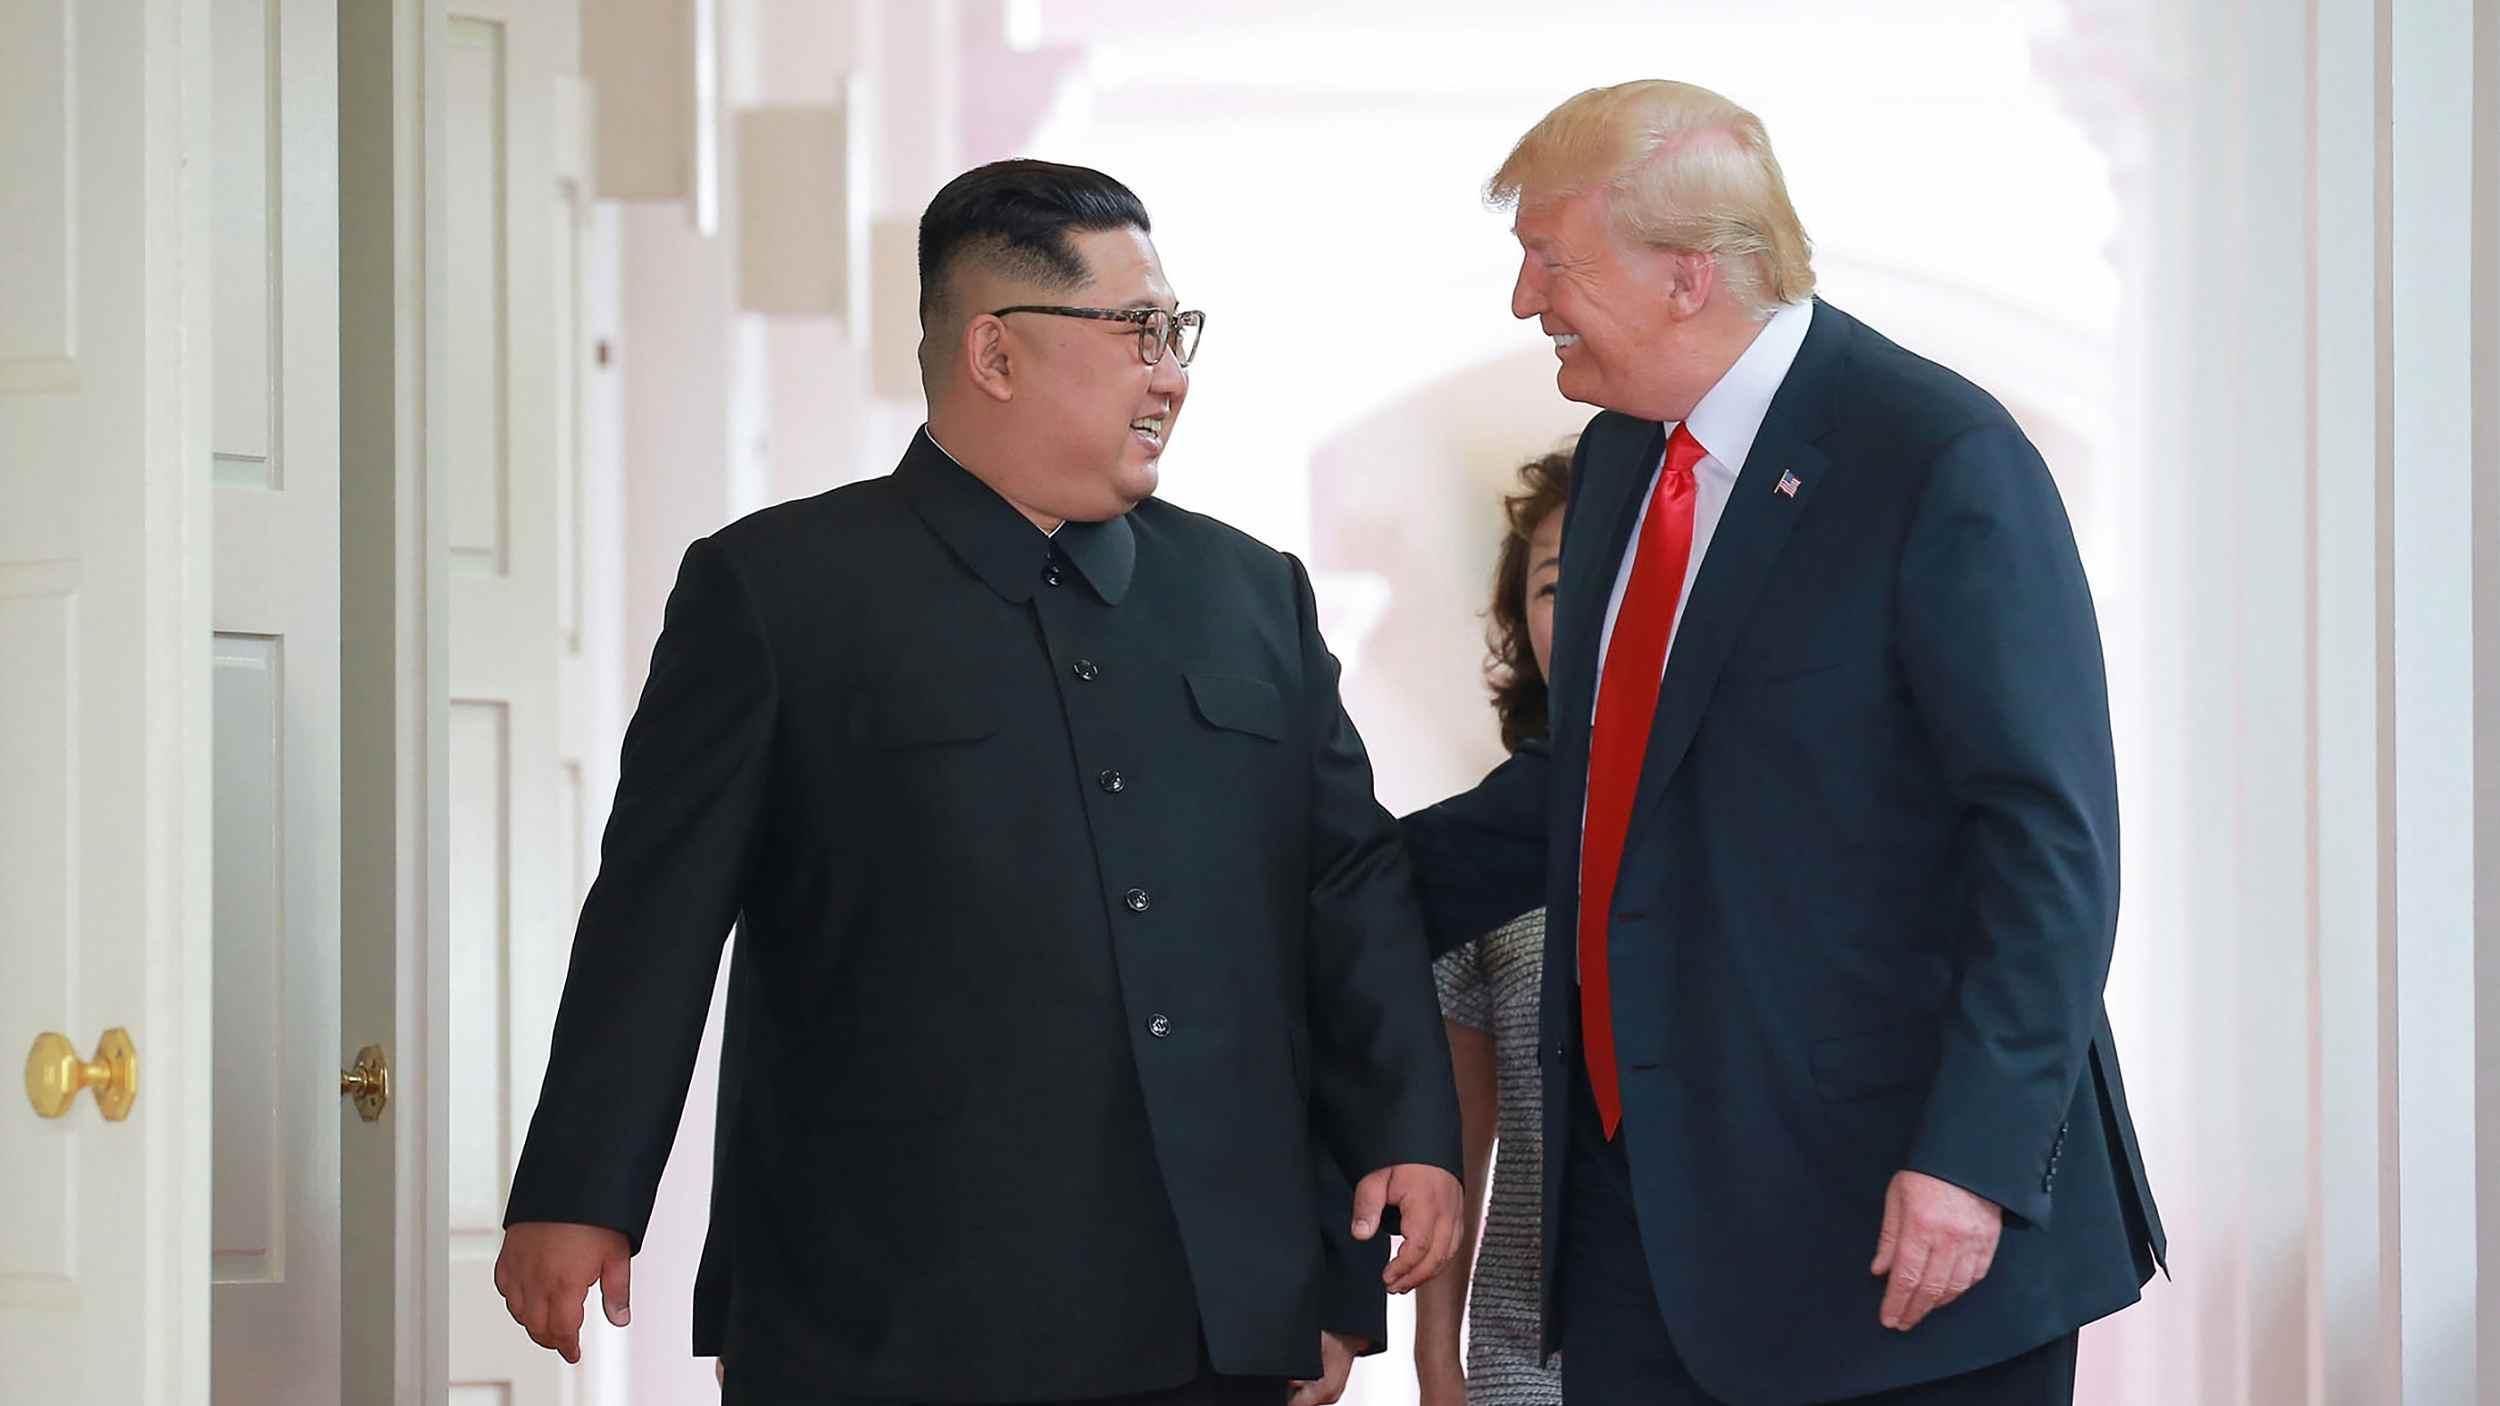 Seoul says S. Korea, China share 'complete denuclearization' goal